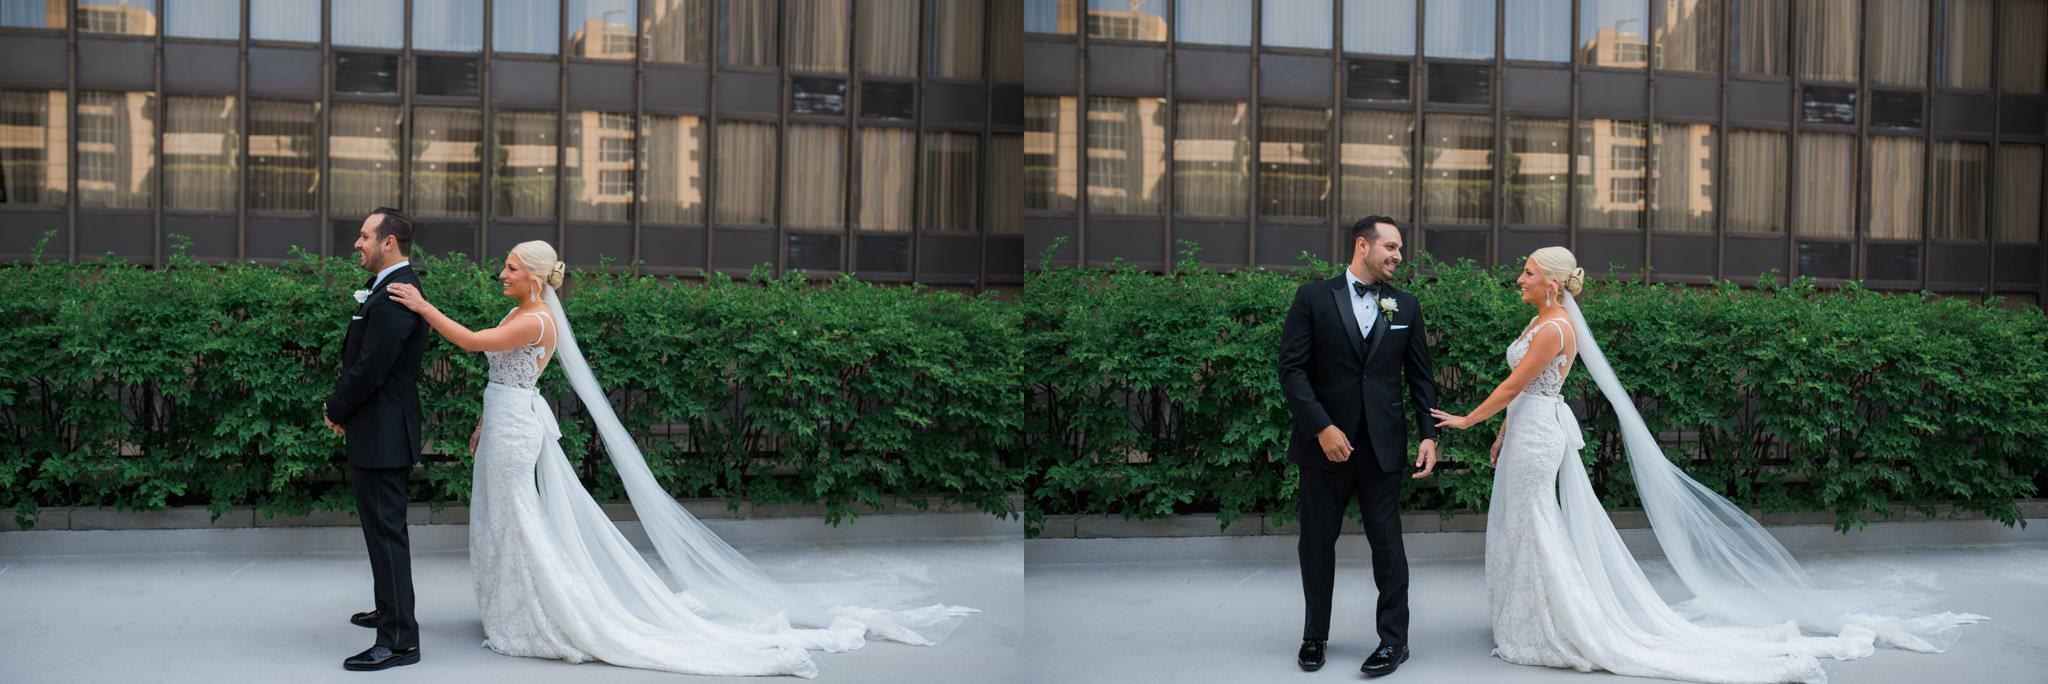 Adler-Planetarium-Chicago-Wedding-Photography-0021.JPG